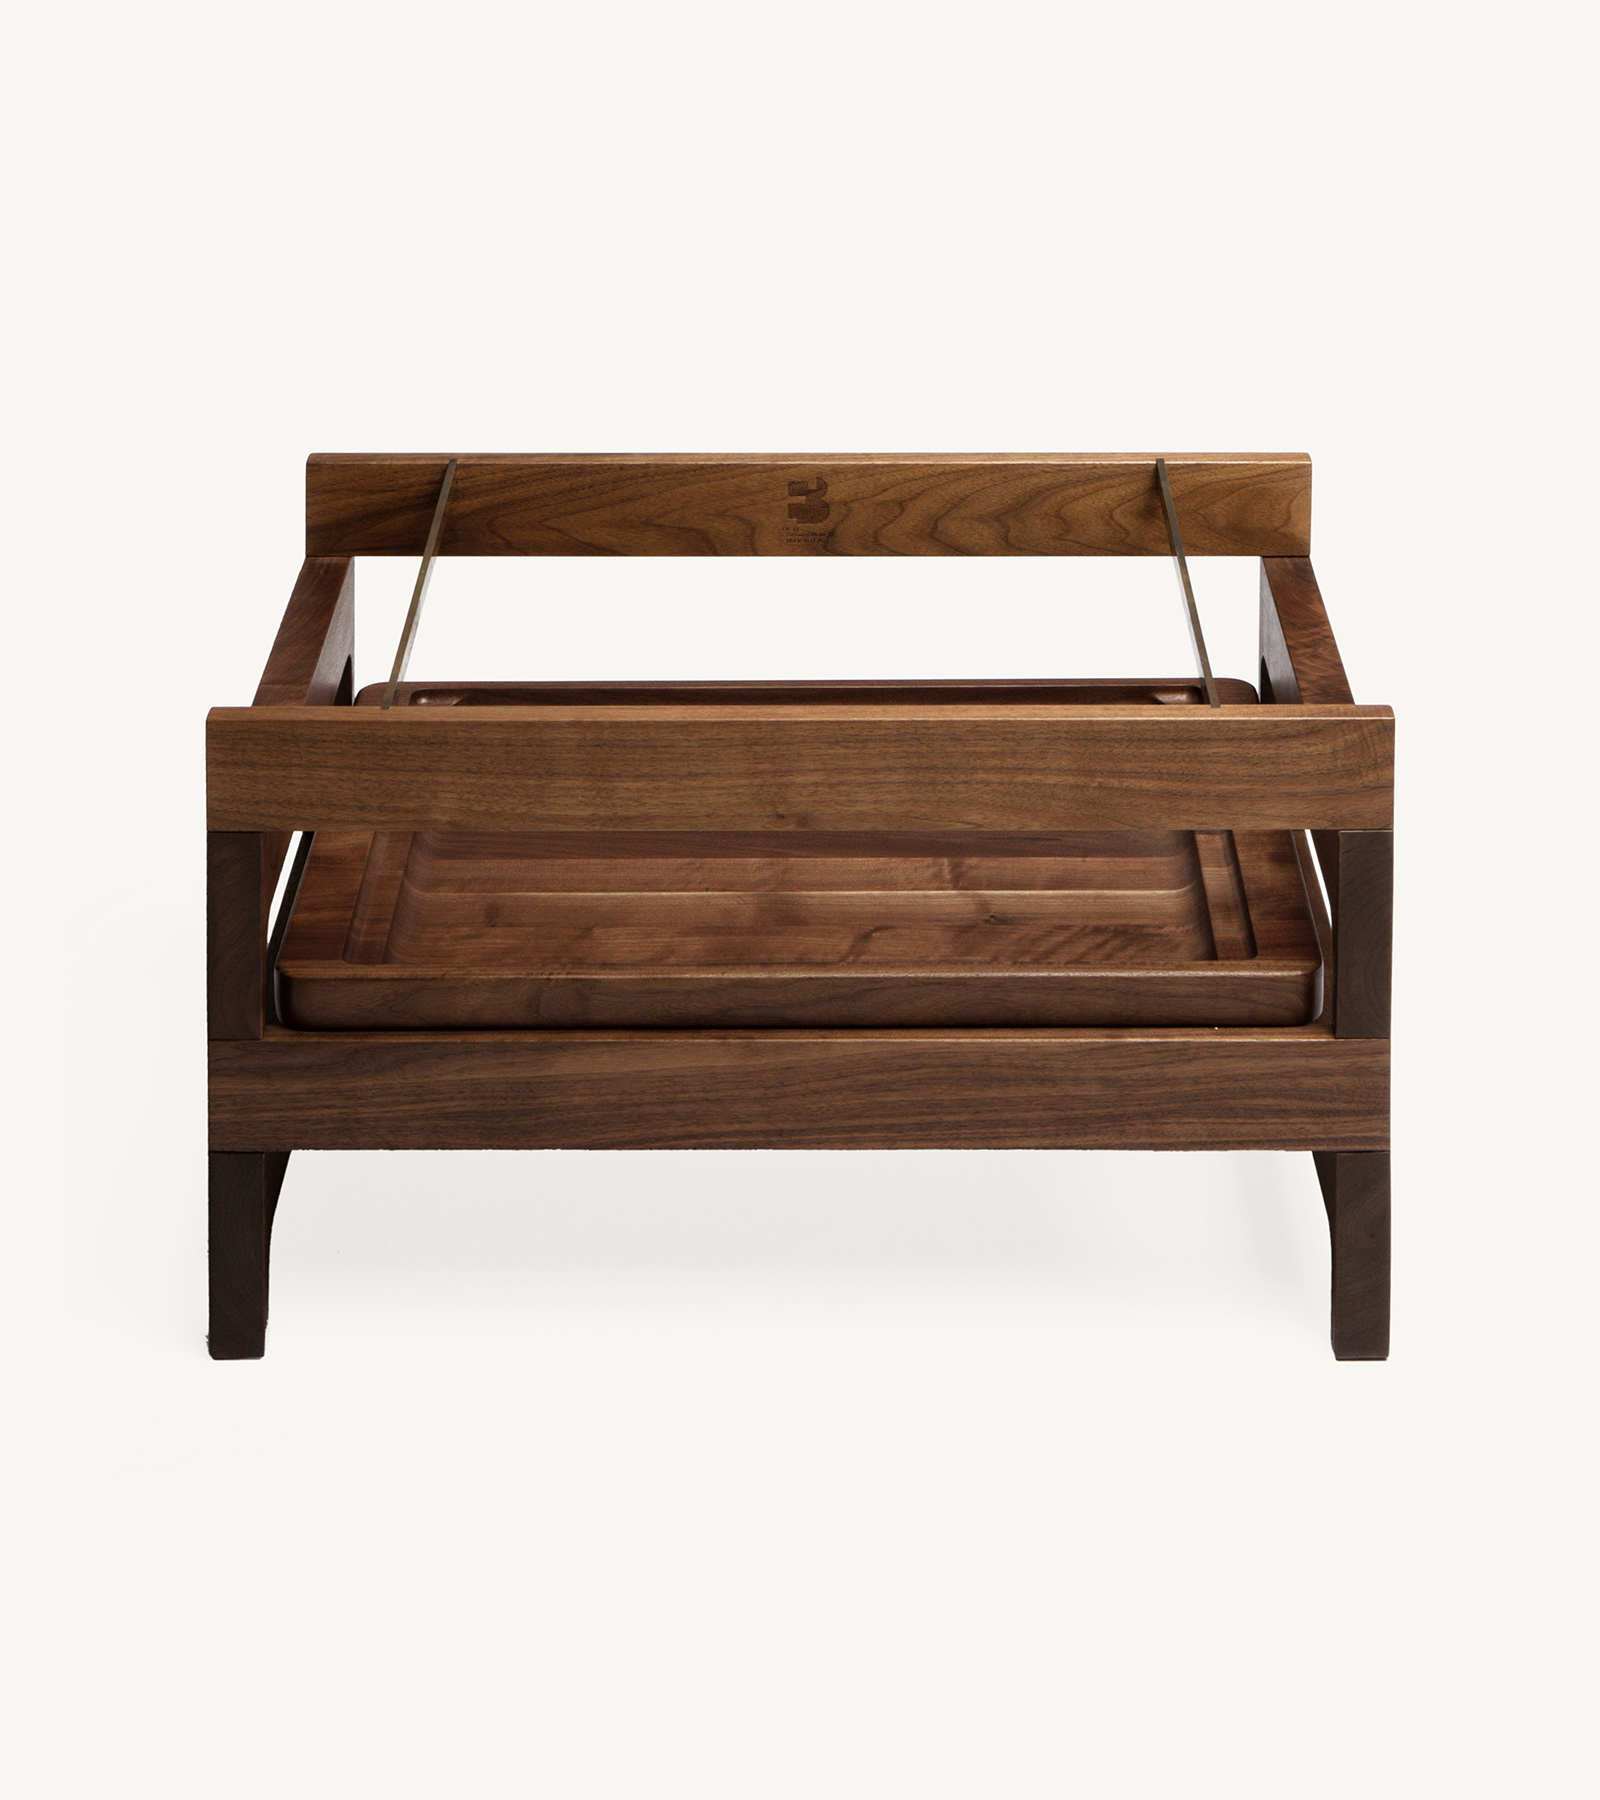 TinnappleMetz-bassamfellows-Tray-Rack-Side-Table-04